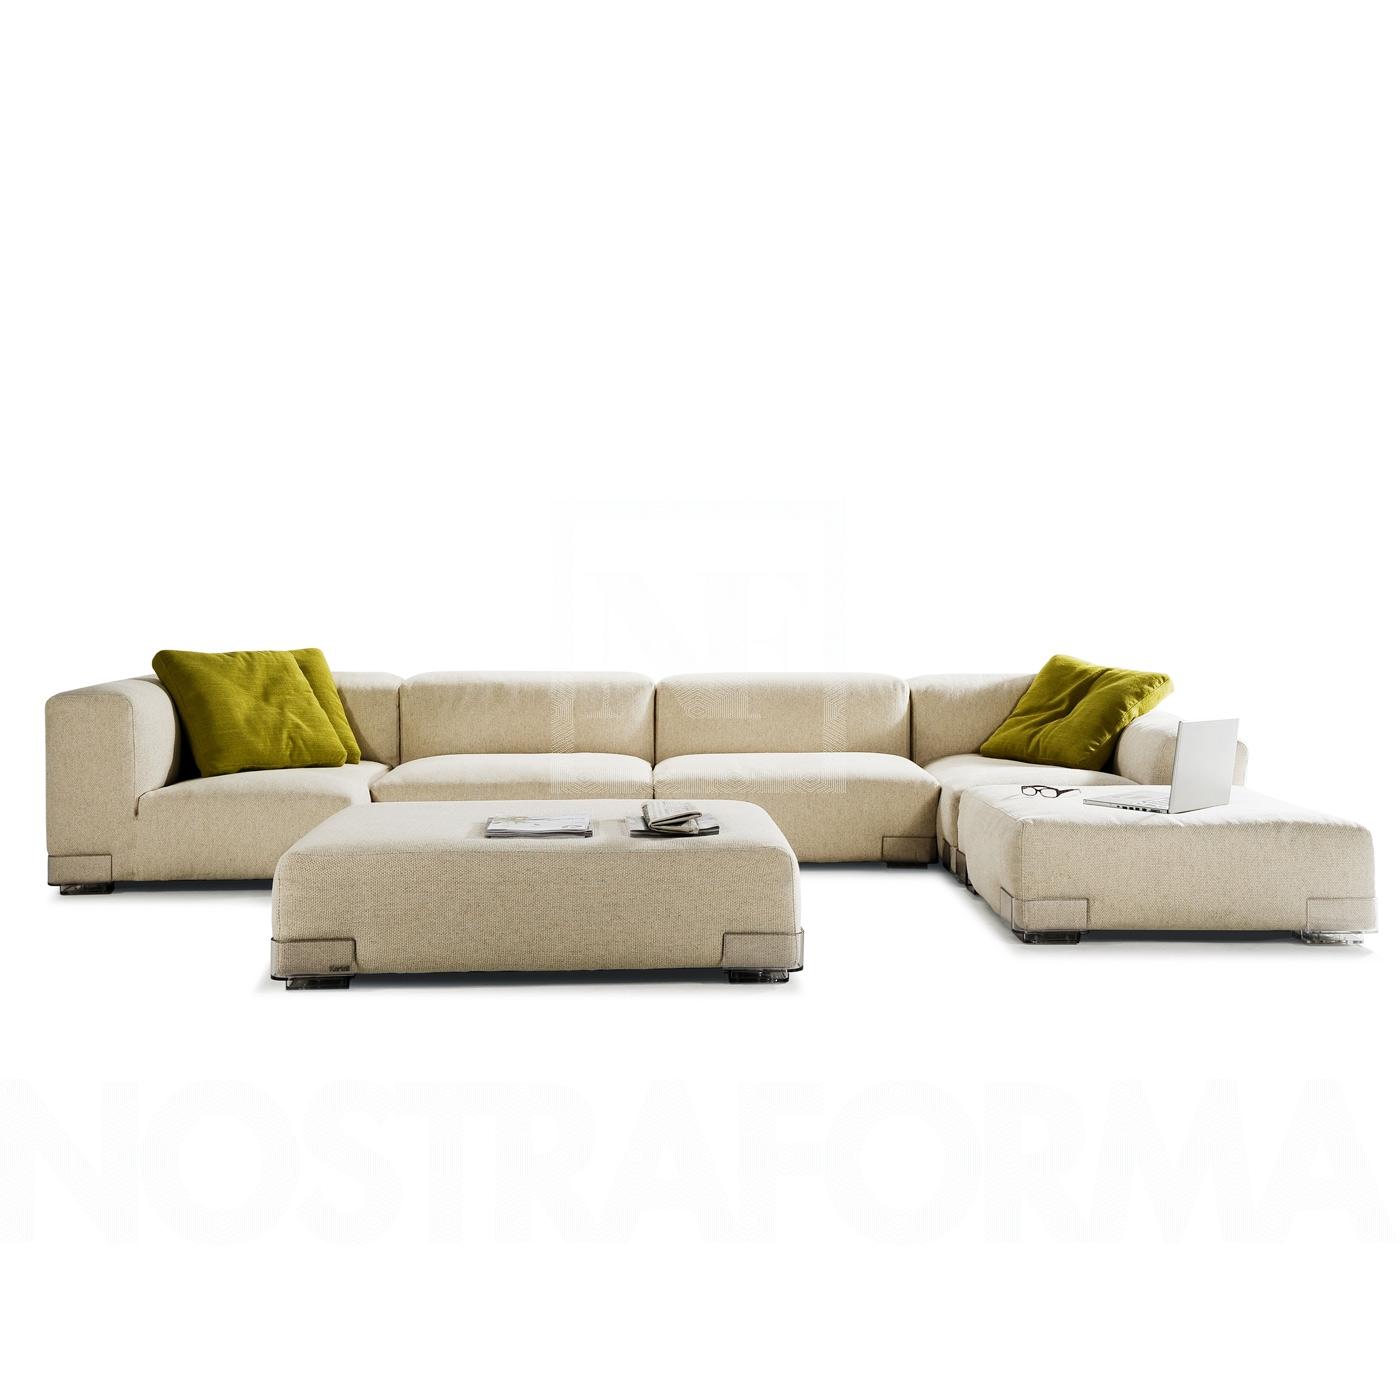 Kartell plastics duo sofa with left arm 88x64cm a7096 for Sofa 400 euro